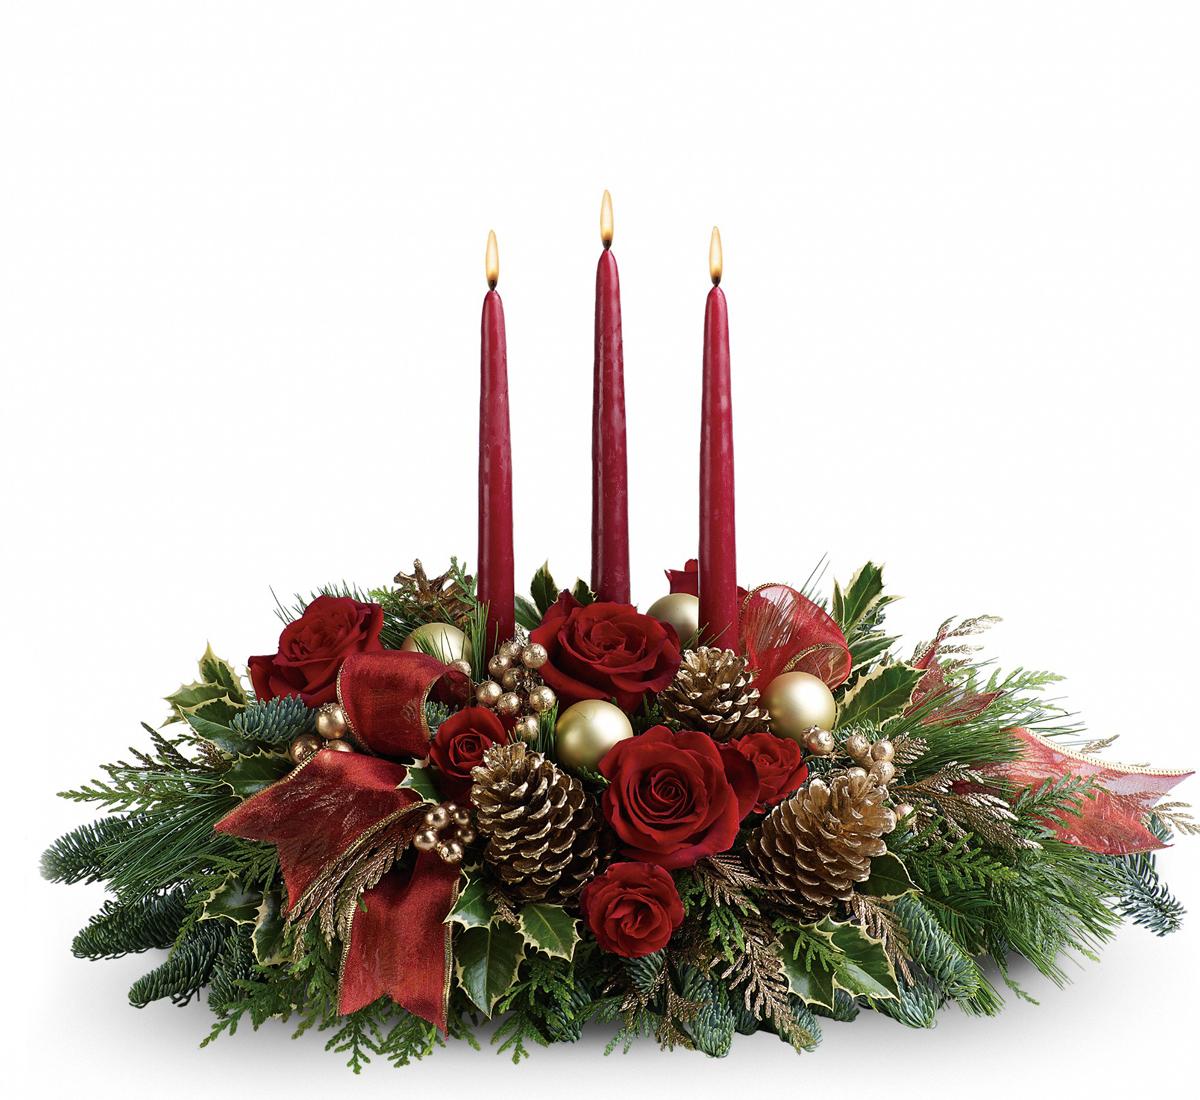 Tall Christmas Floral Arrangements